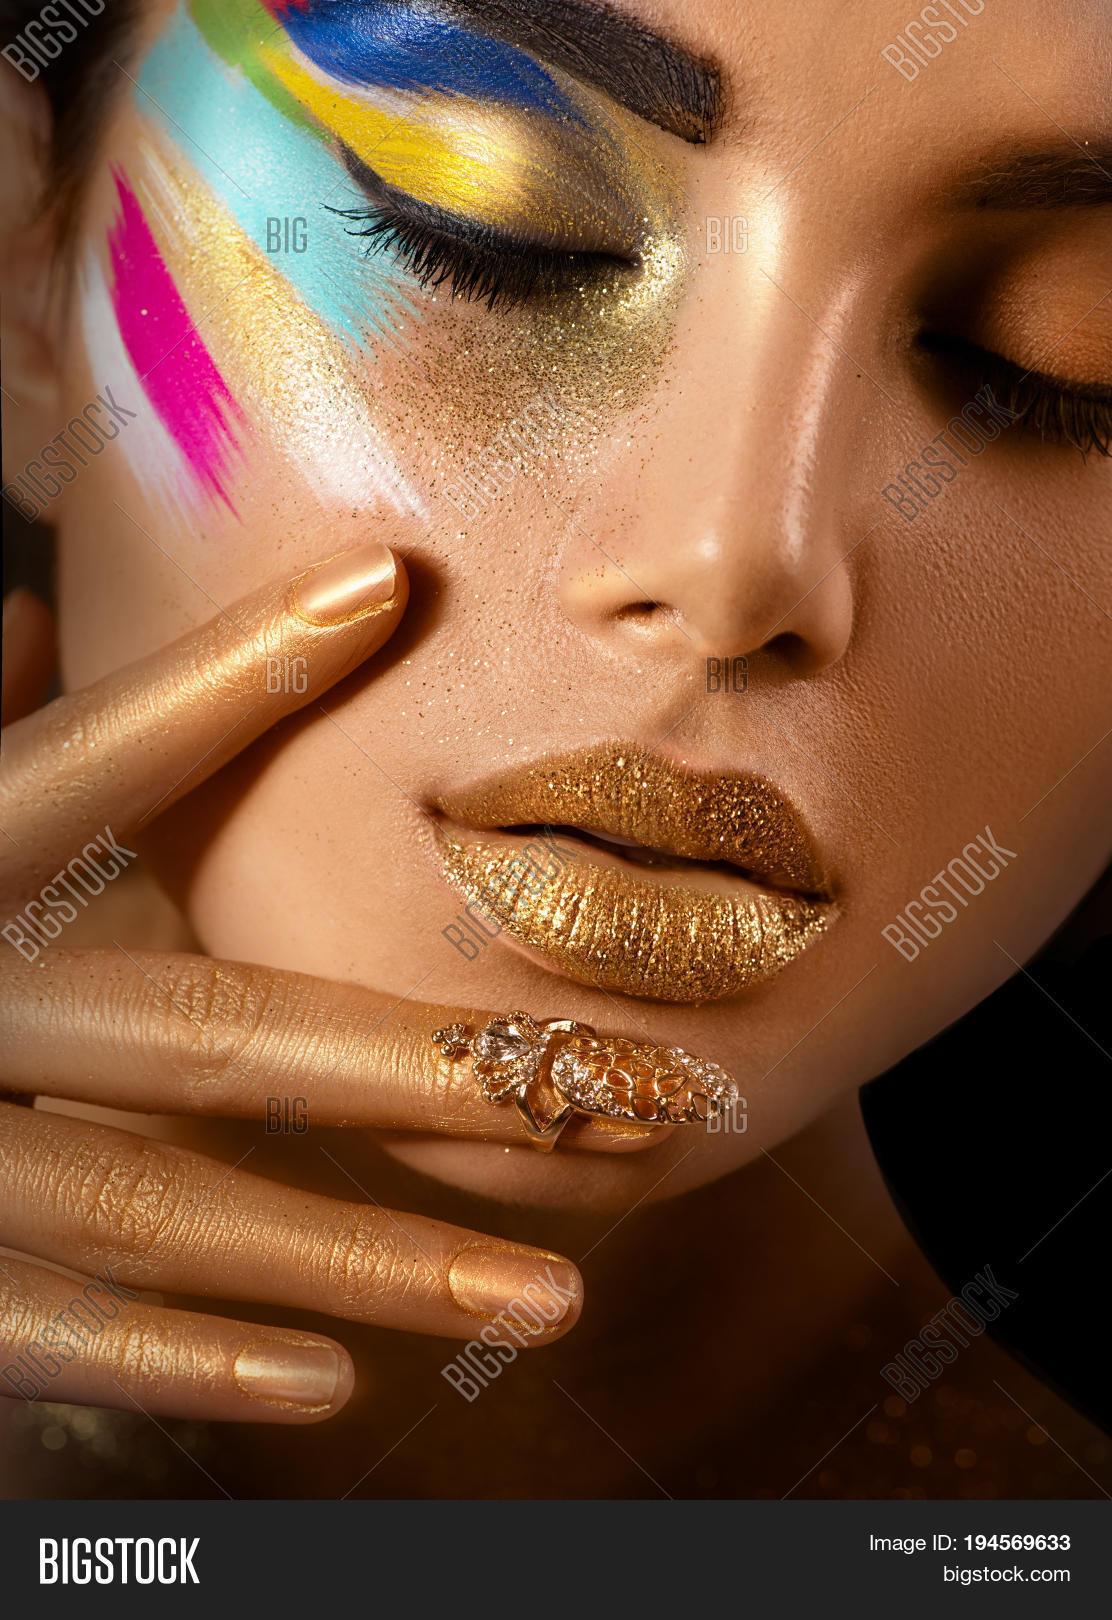 Fashion Model Girl Image Photo Free Trial Bigstock